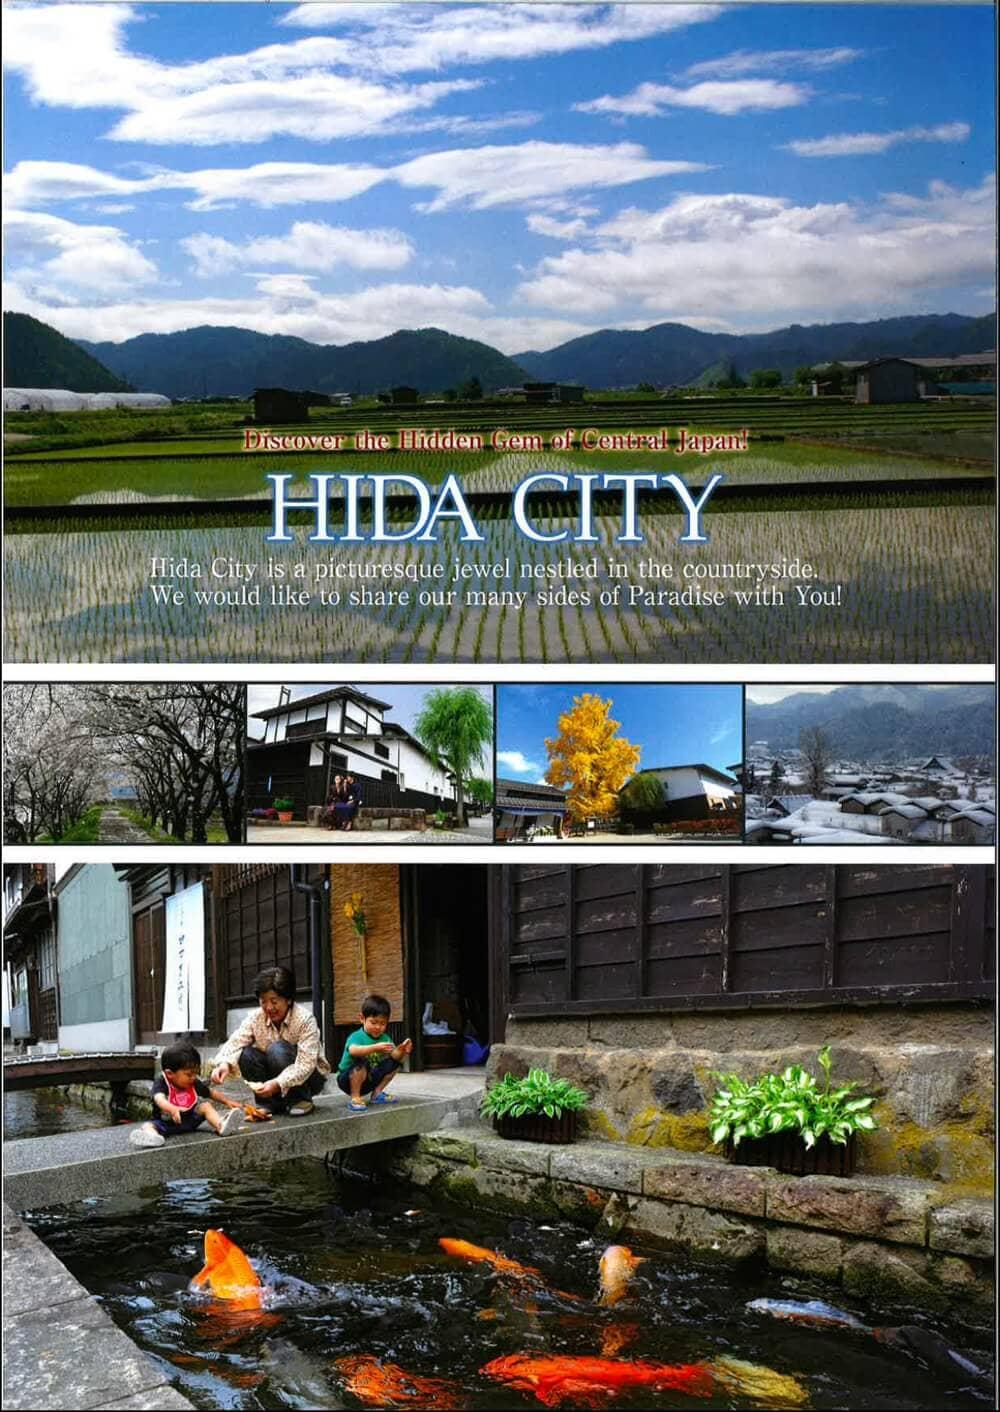 Discover-the-Hiddn-Gem-of-Central-Japan!HIDA-CITY